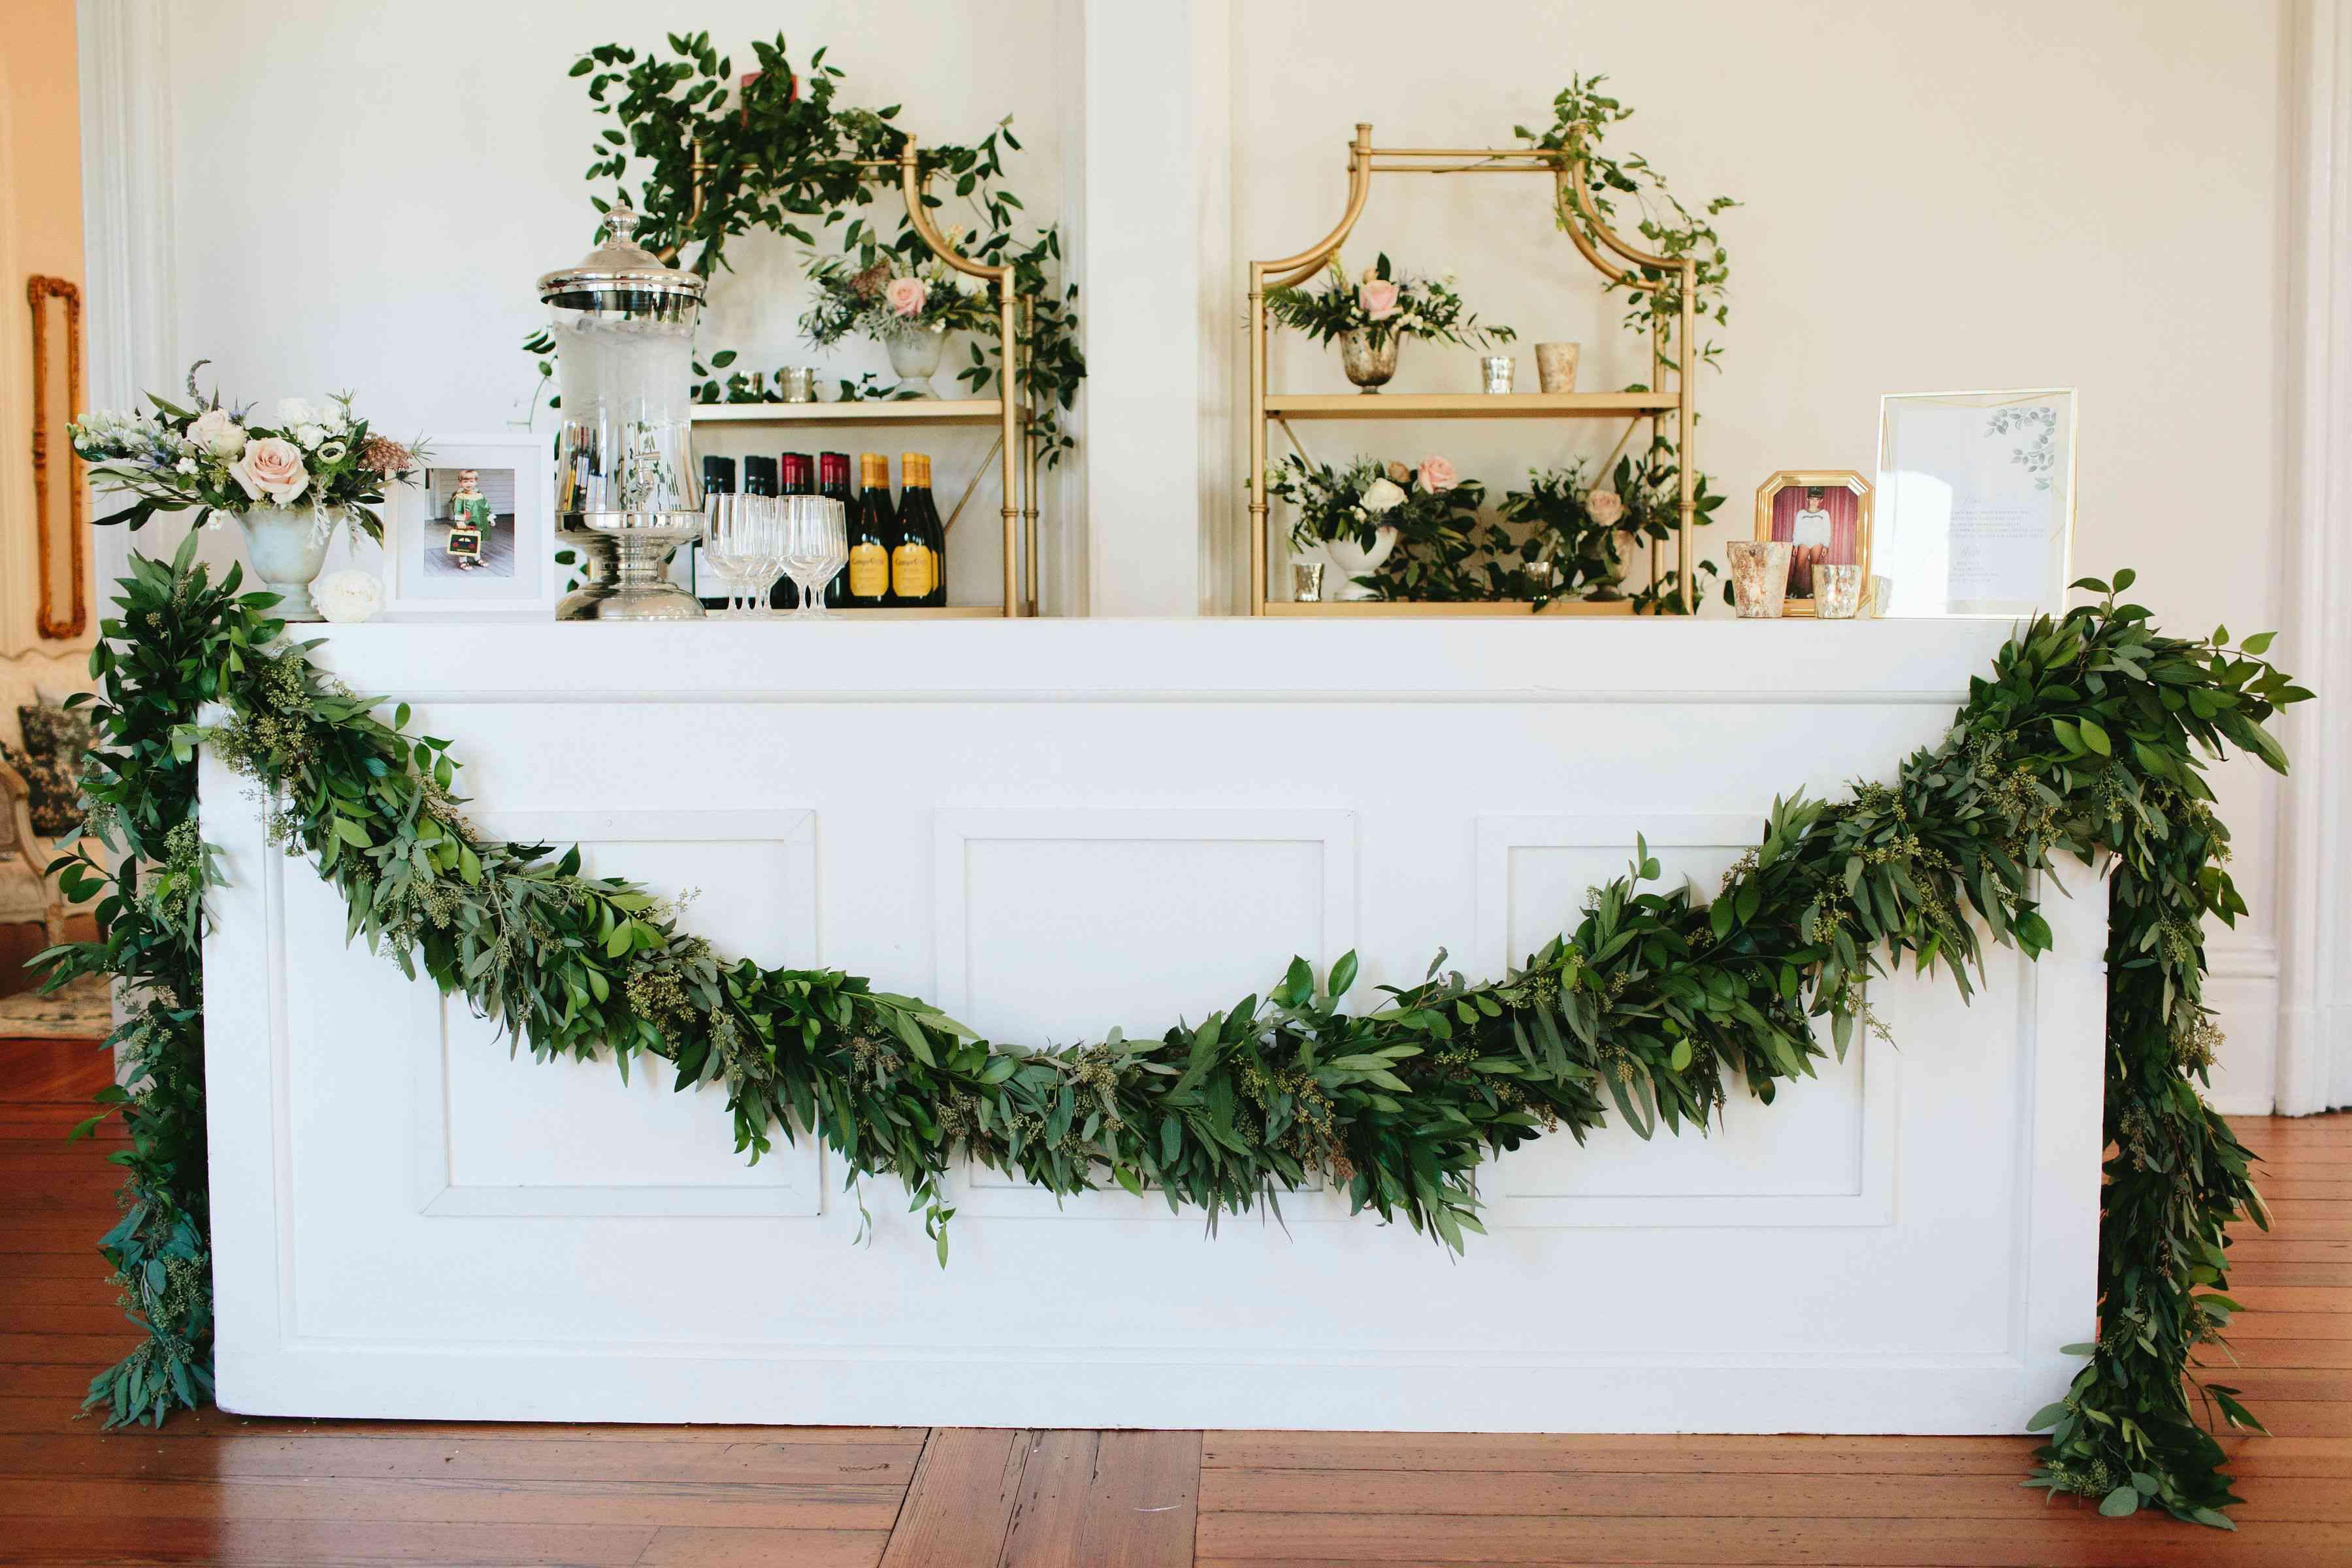 Bar draped with greenery garland